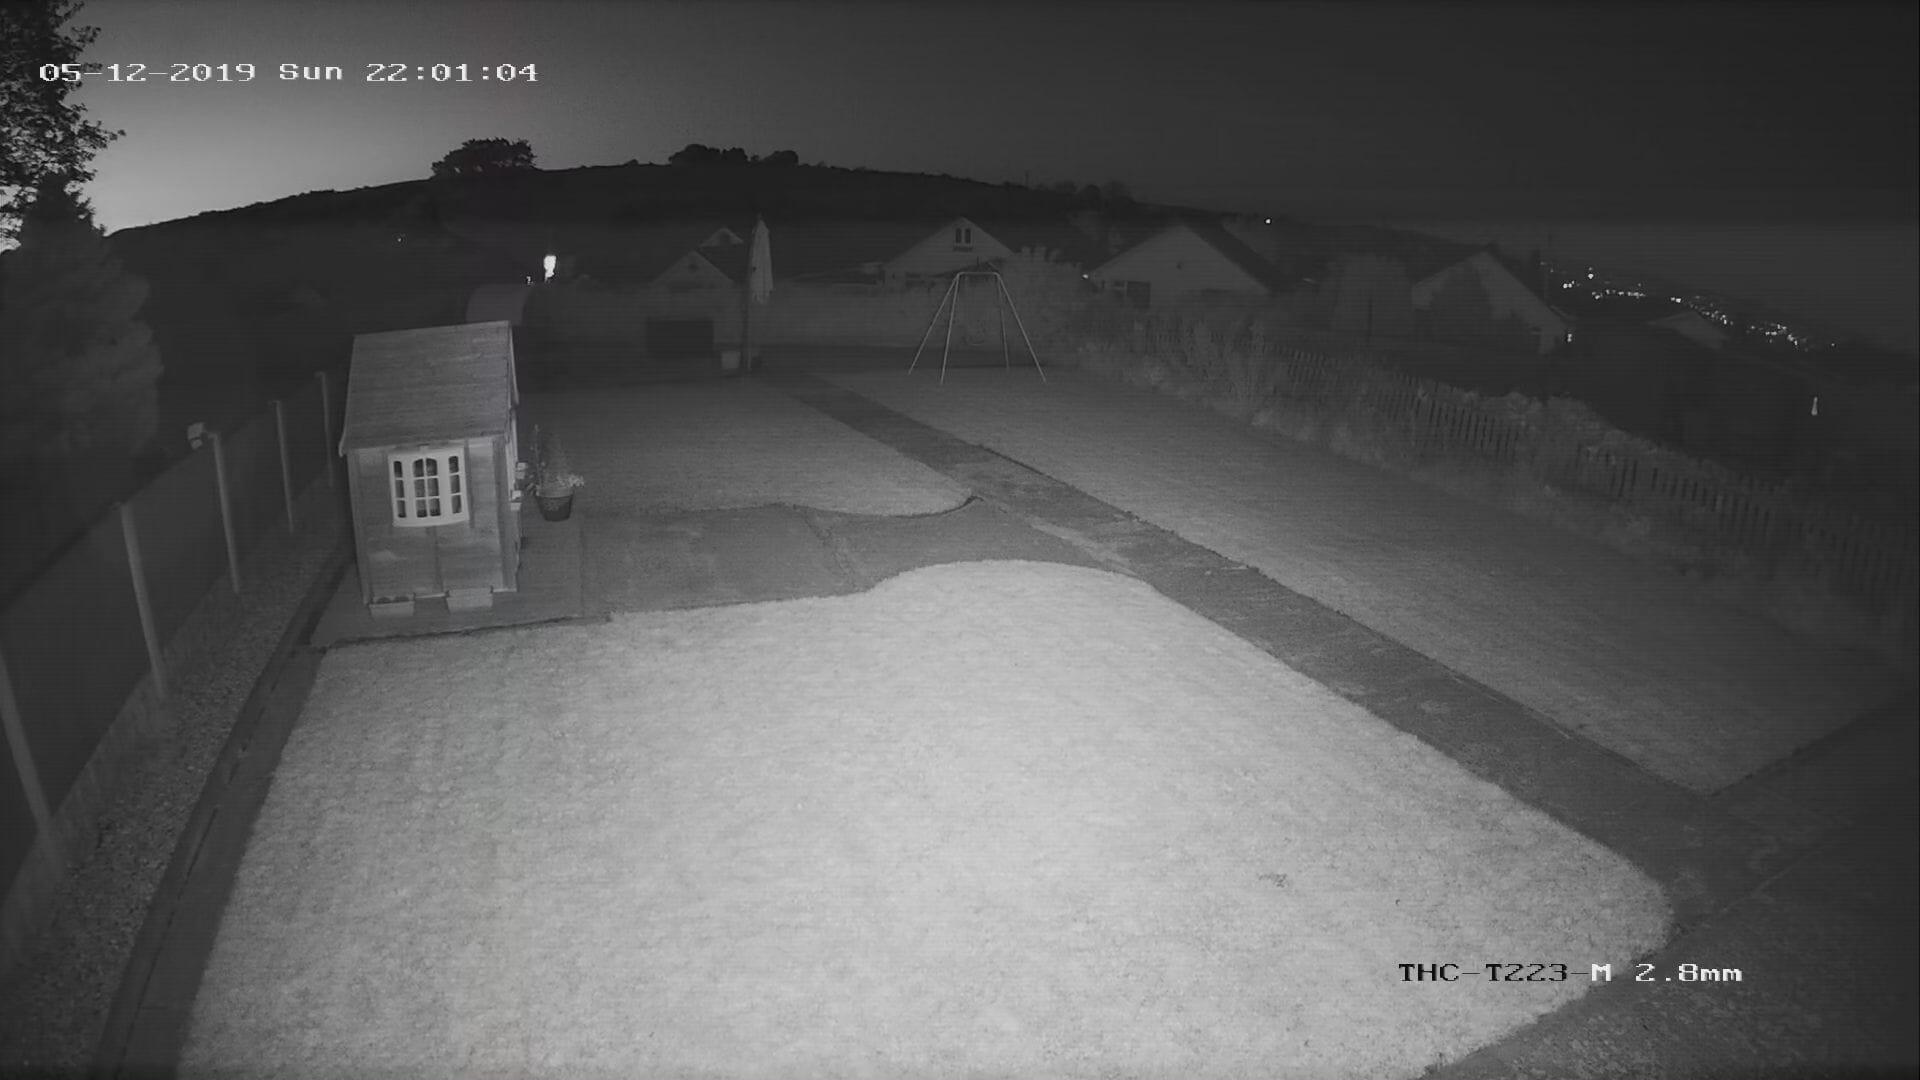 THC-T223-M_Night_2.8mm.jpg